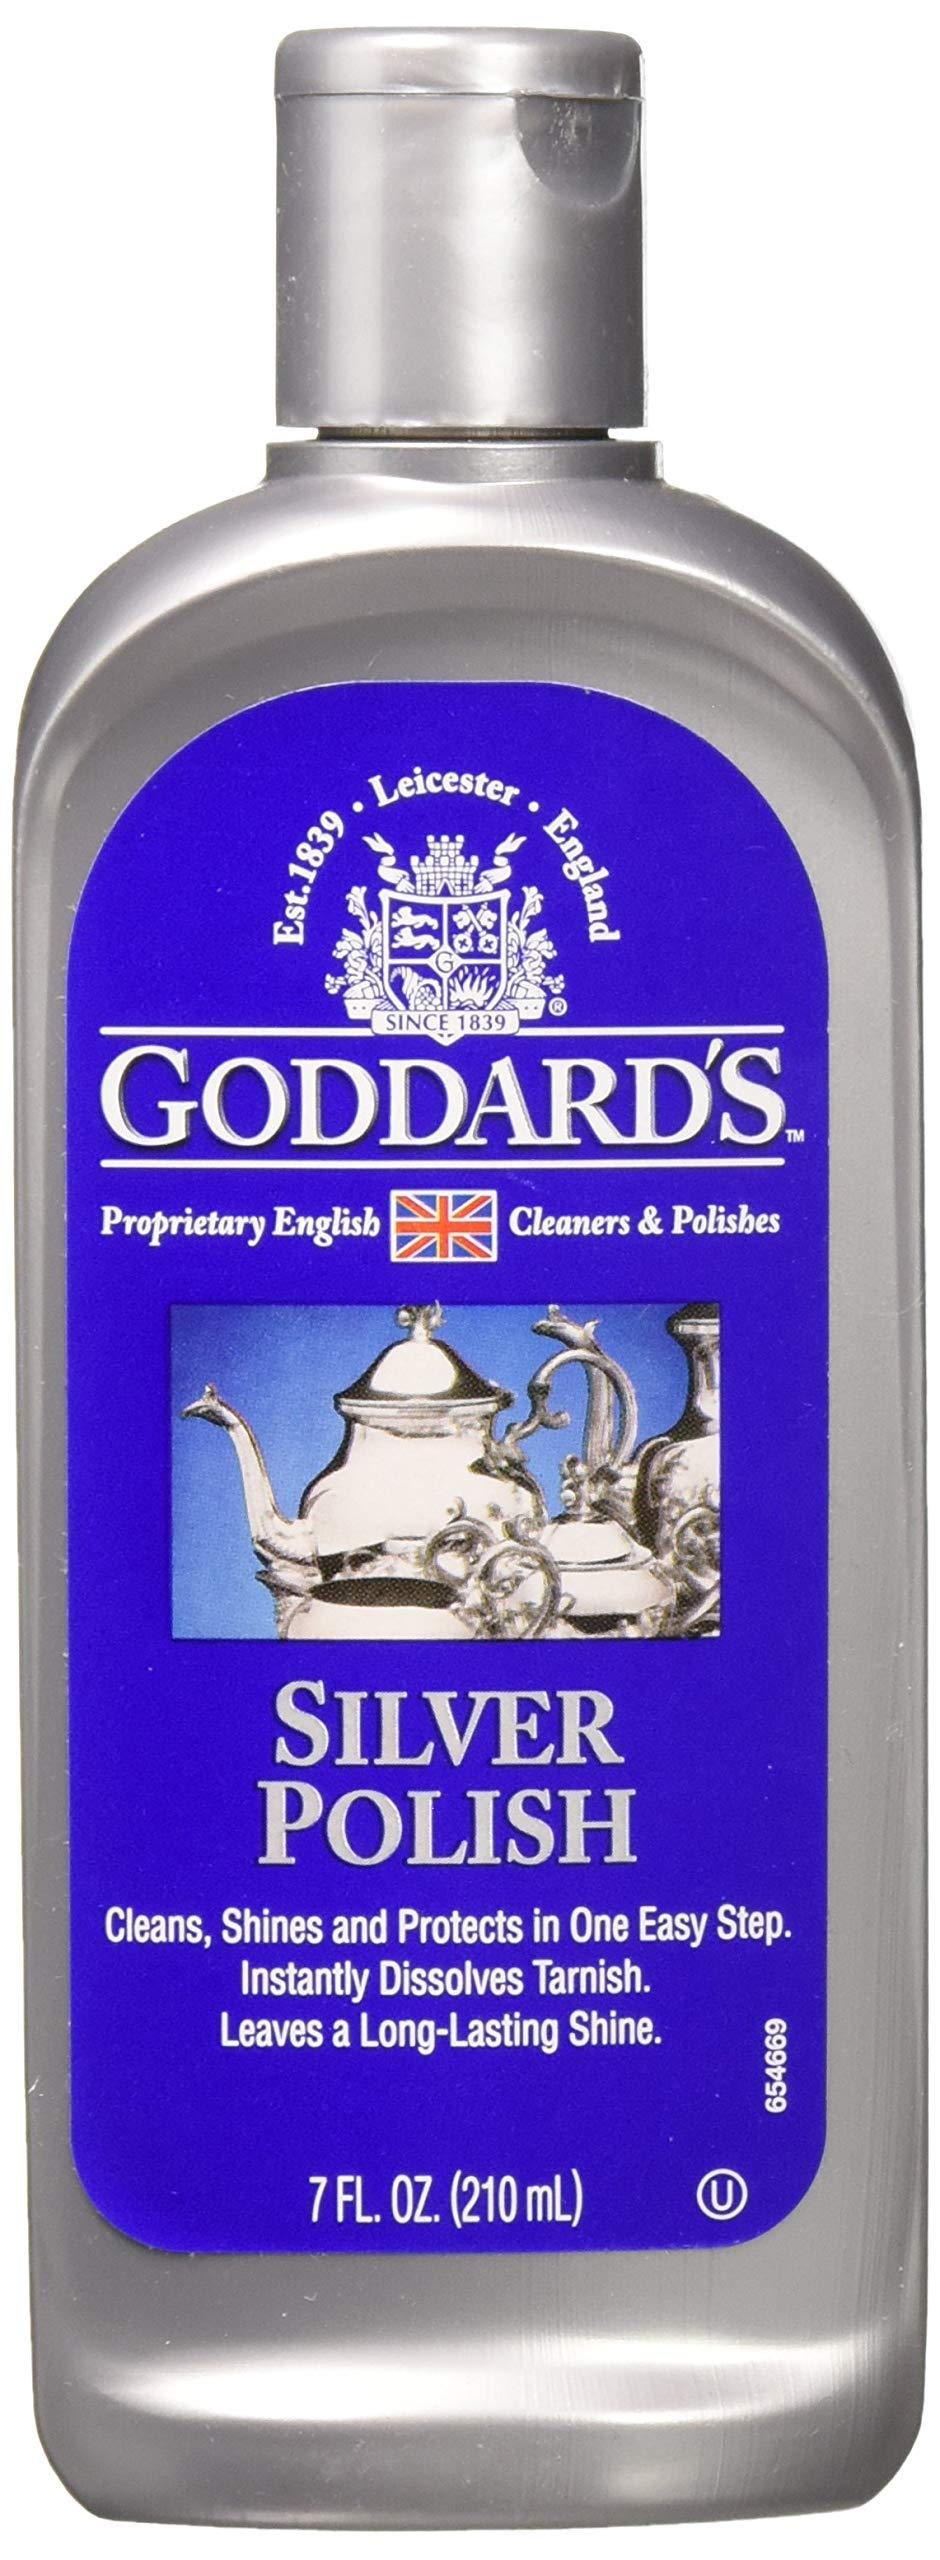 Goddard's Silver Polish Liquid